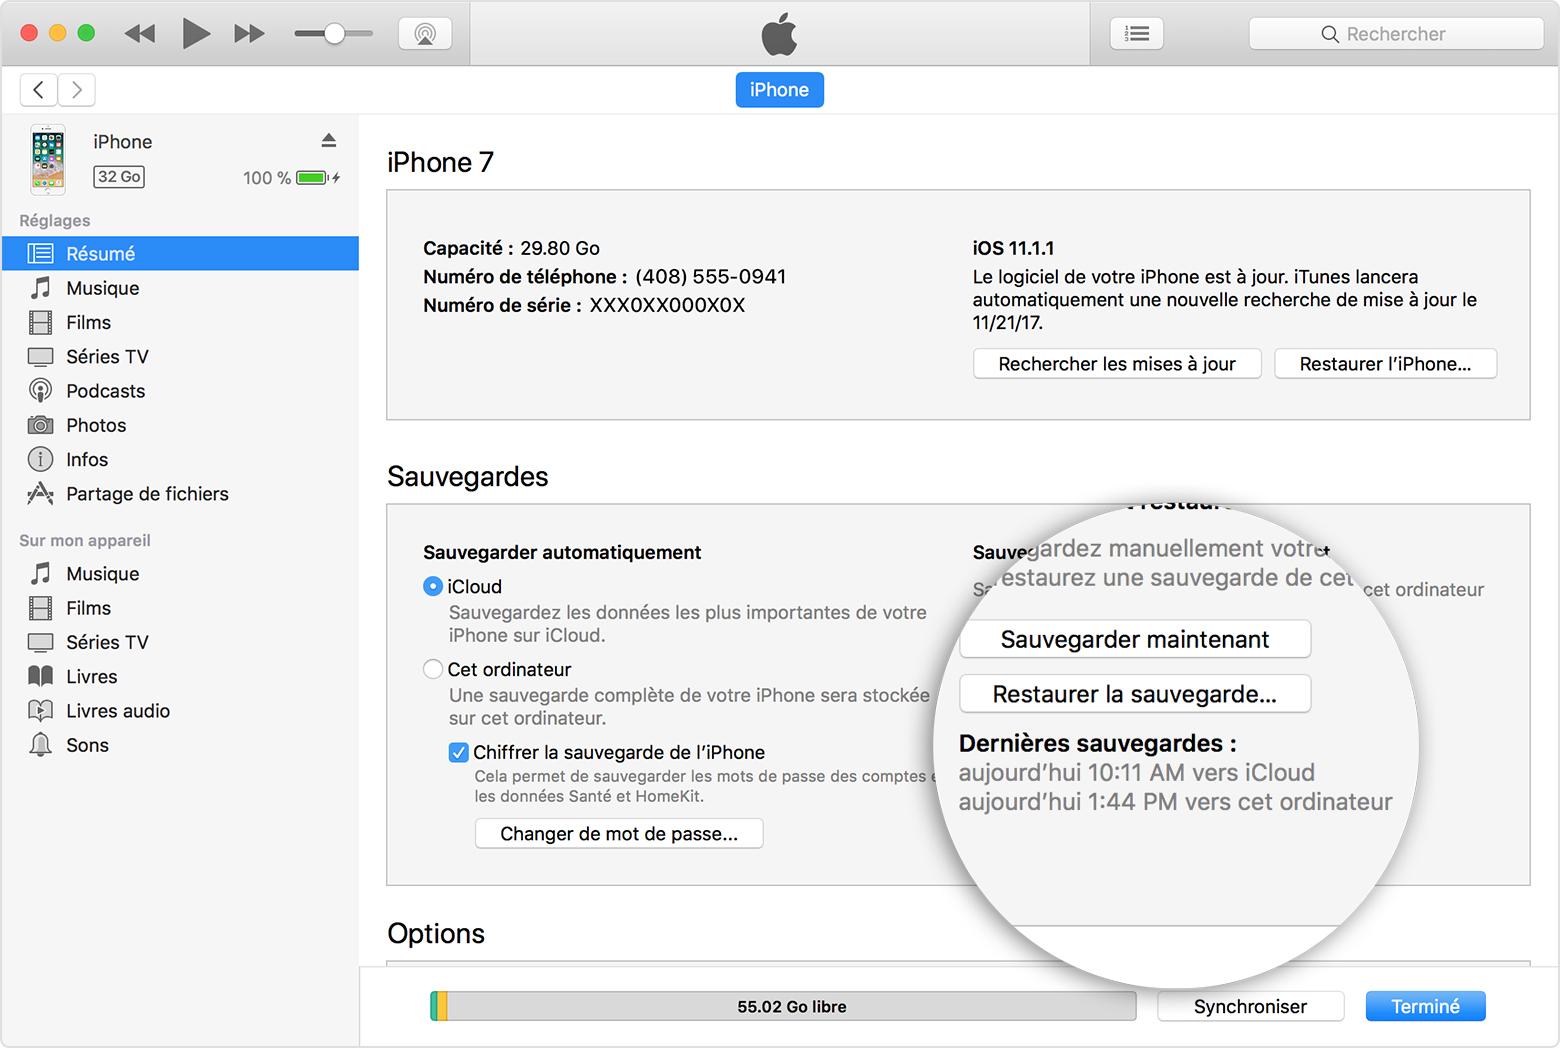 macos itunes12 7 iphone7 summary backups 2